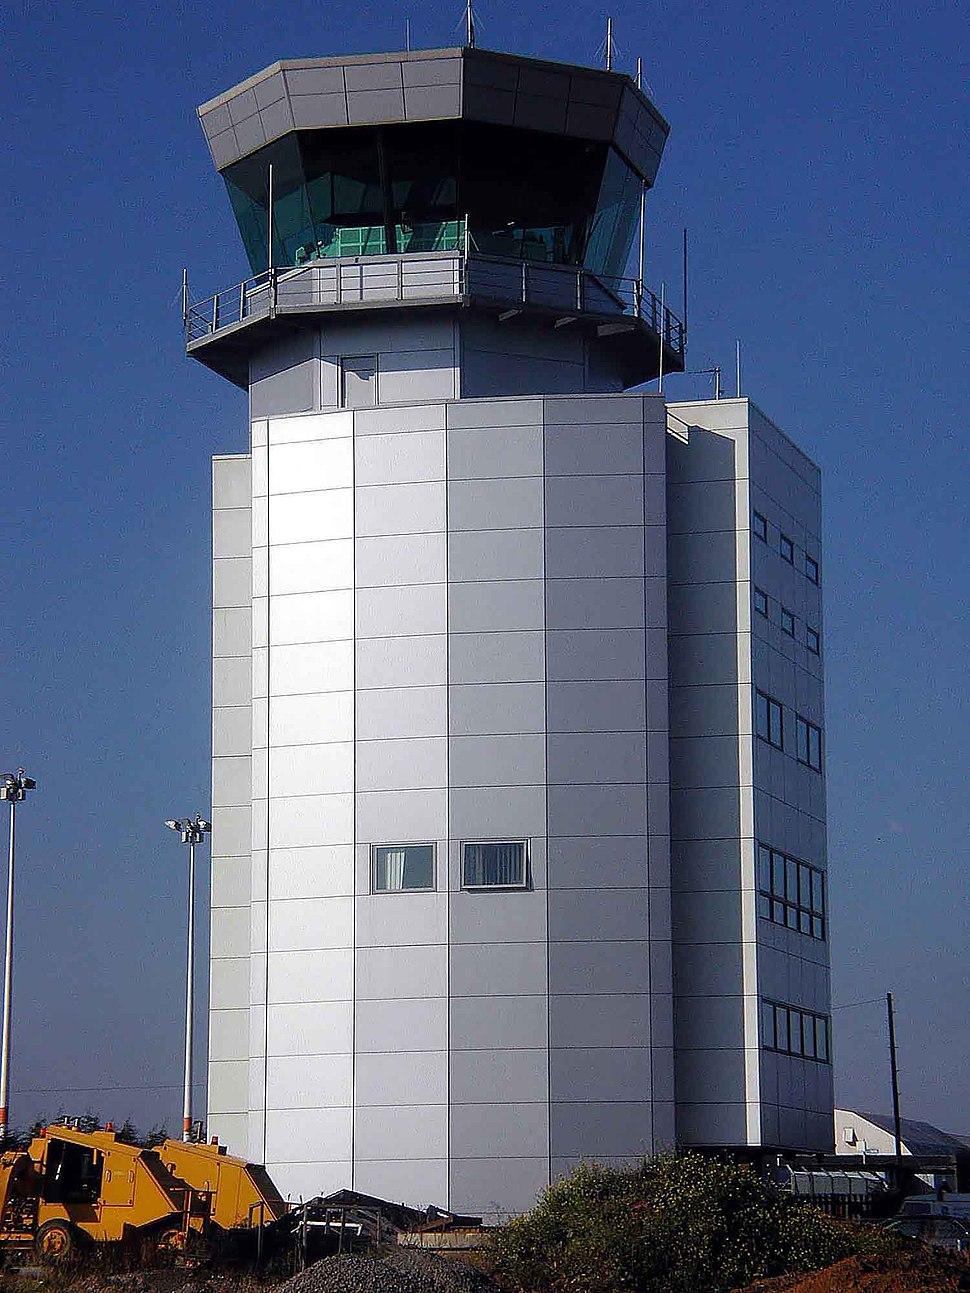 Bristol.airport.tower.arp